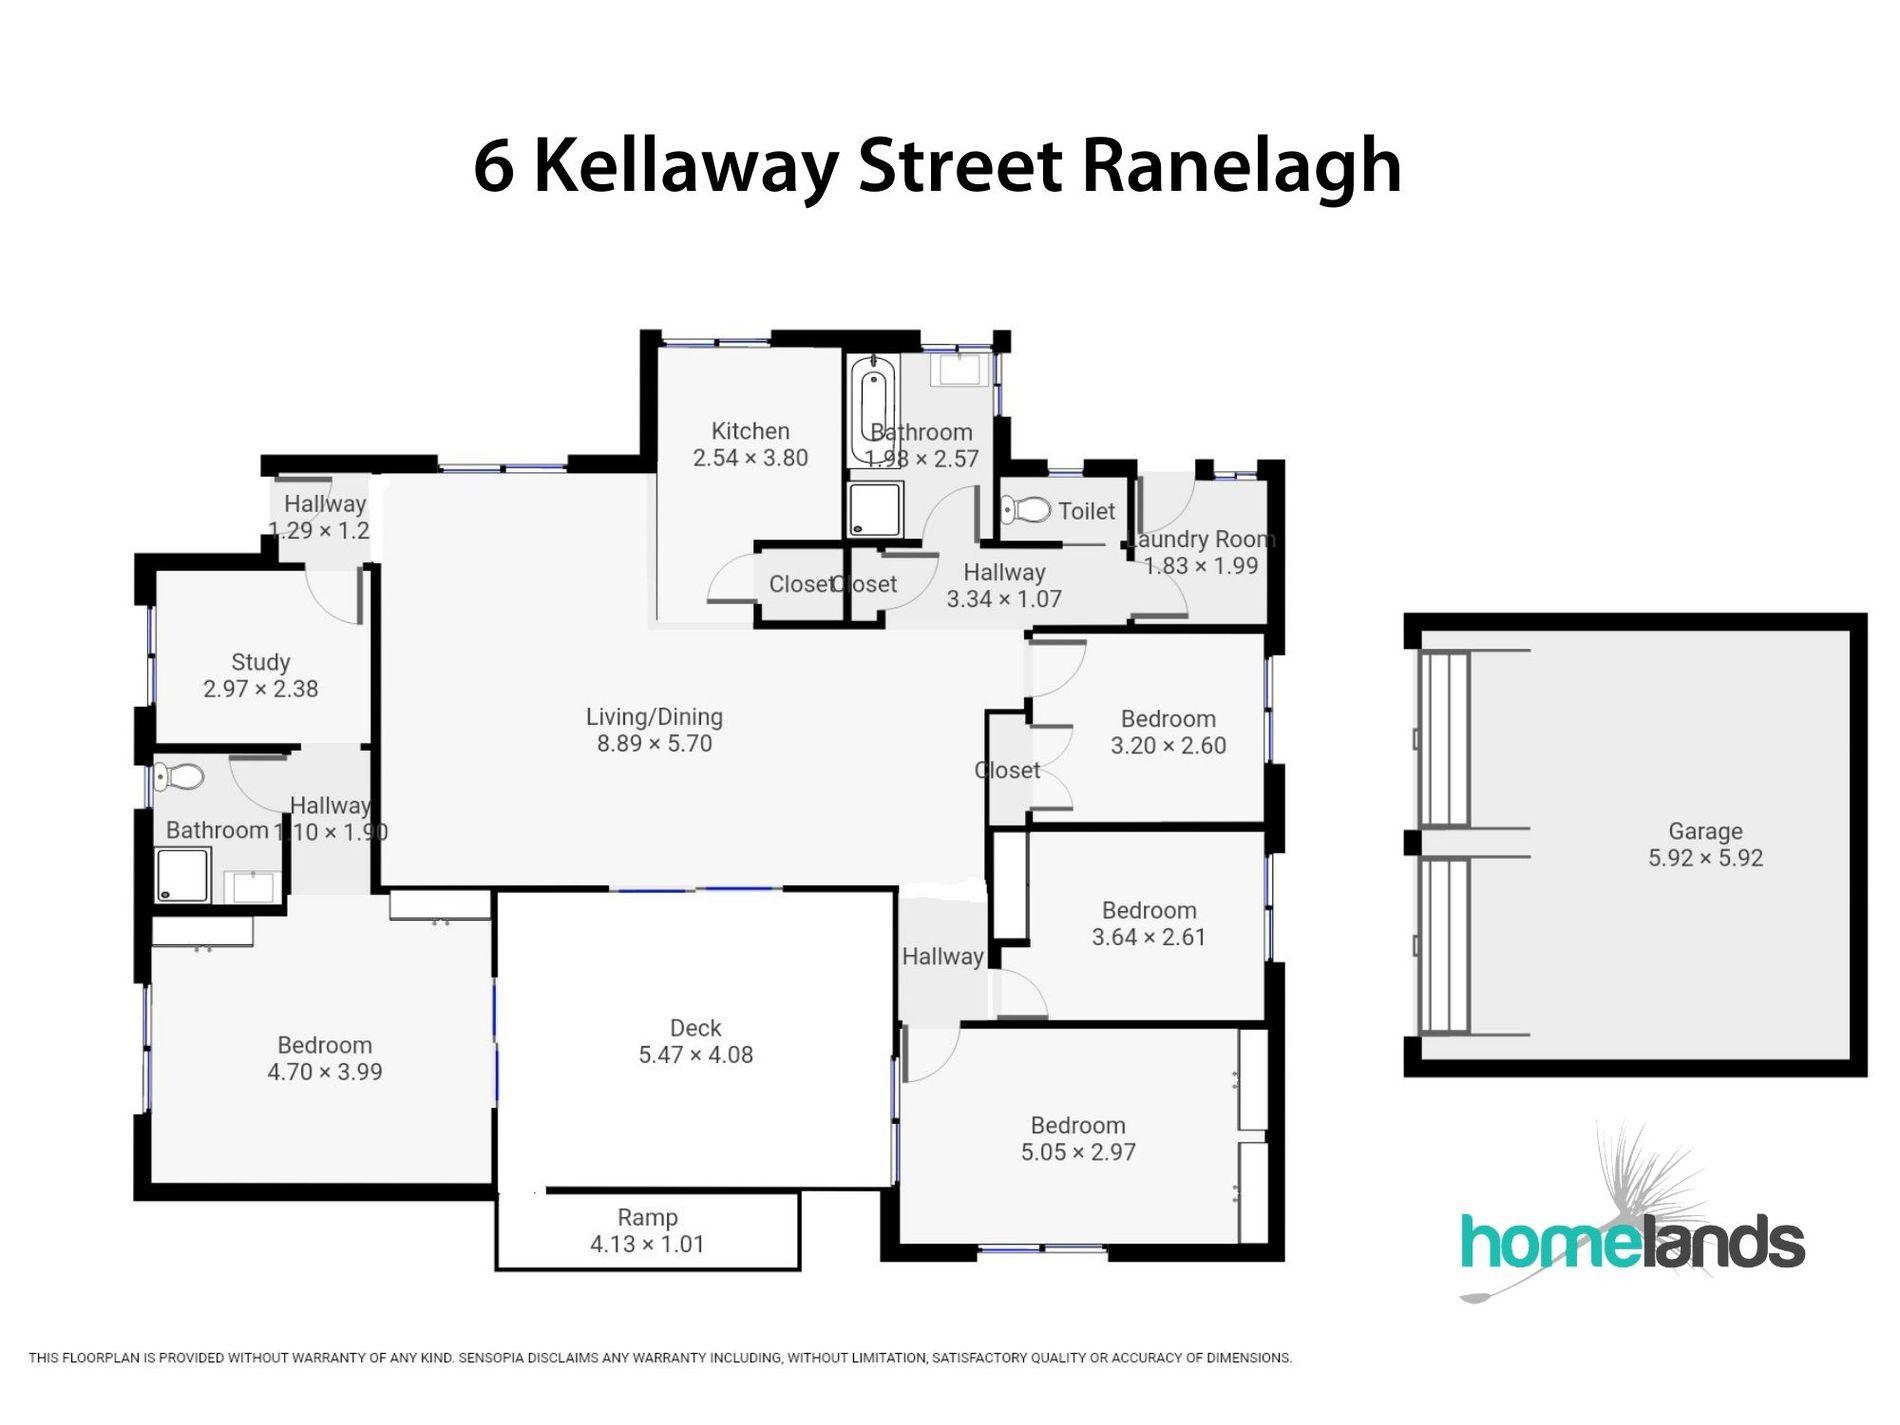 6 Kellaway Street, Ranelagh